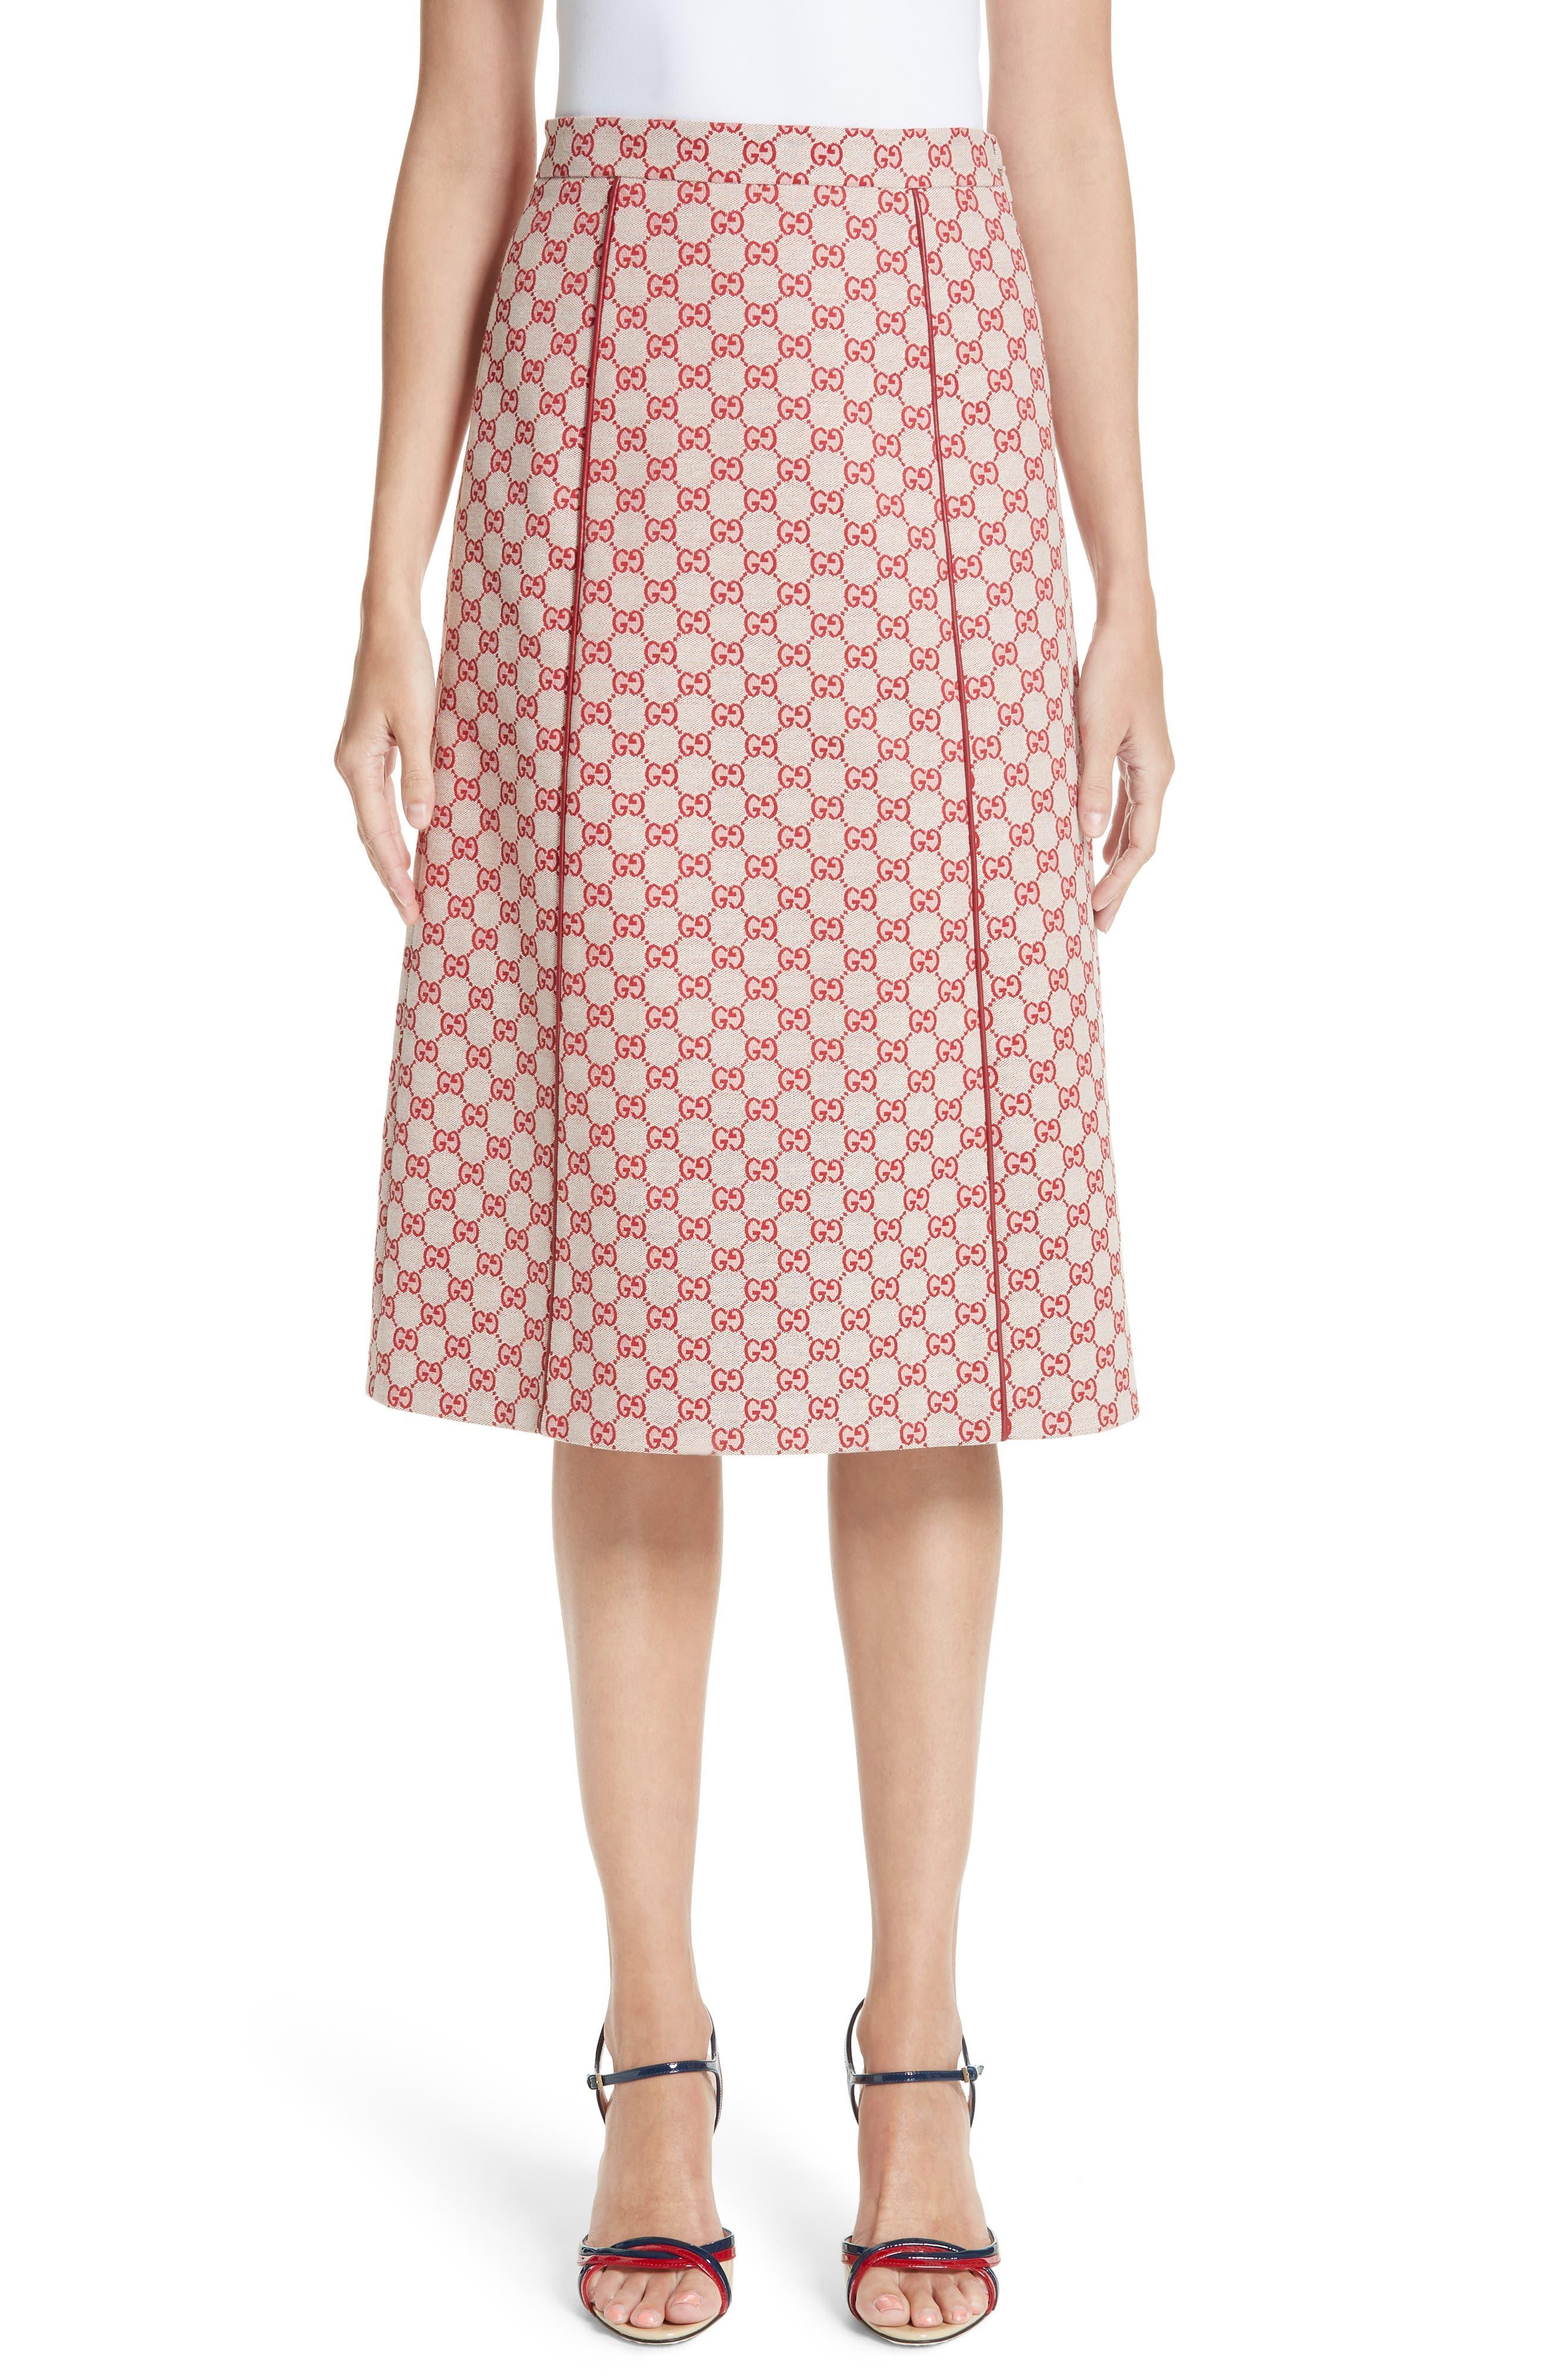 GG Print Canvas A-Line Skirt,                         Main,                         color, GARDENIA/ HIBISCUS RED